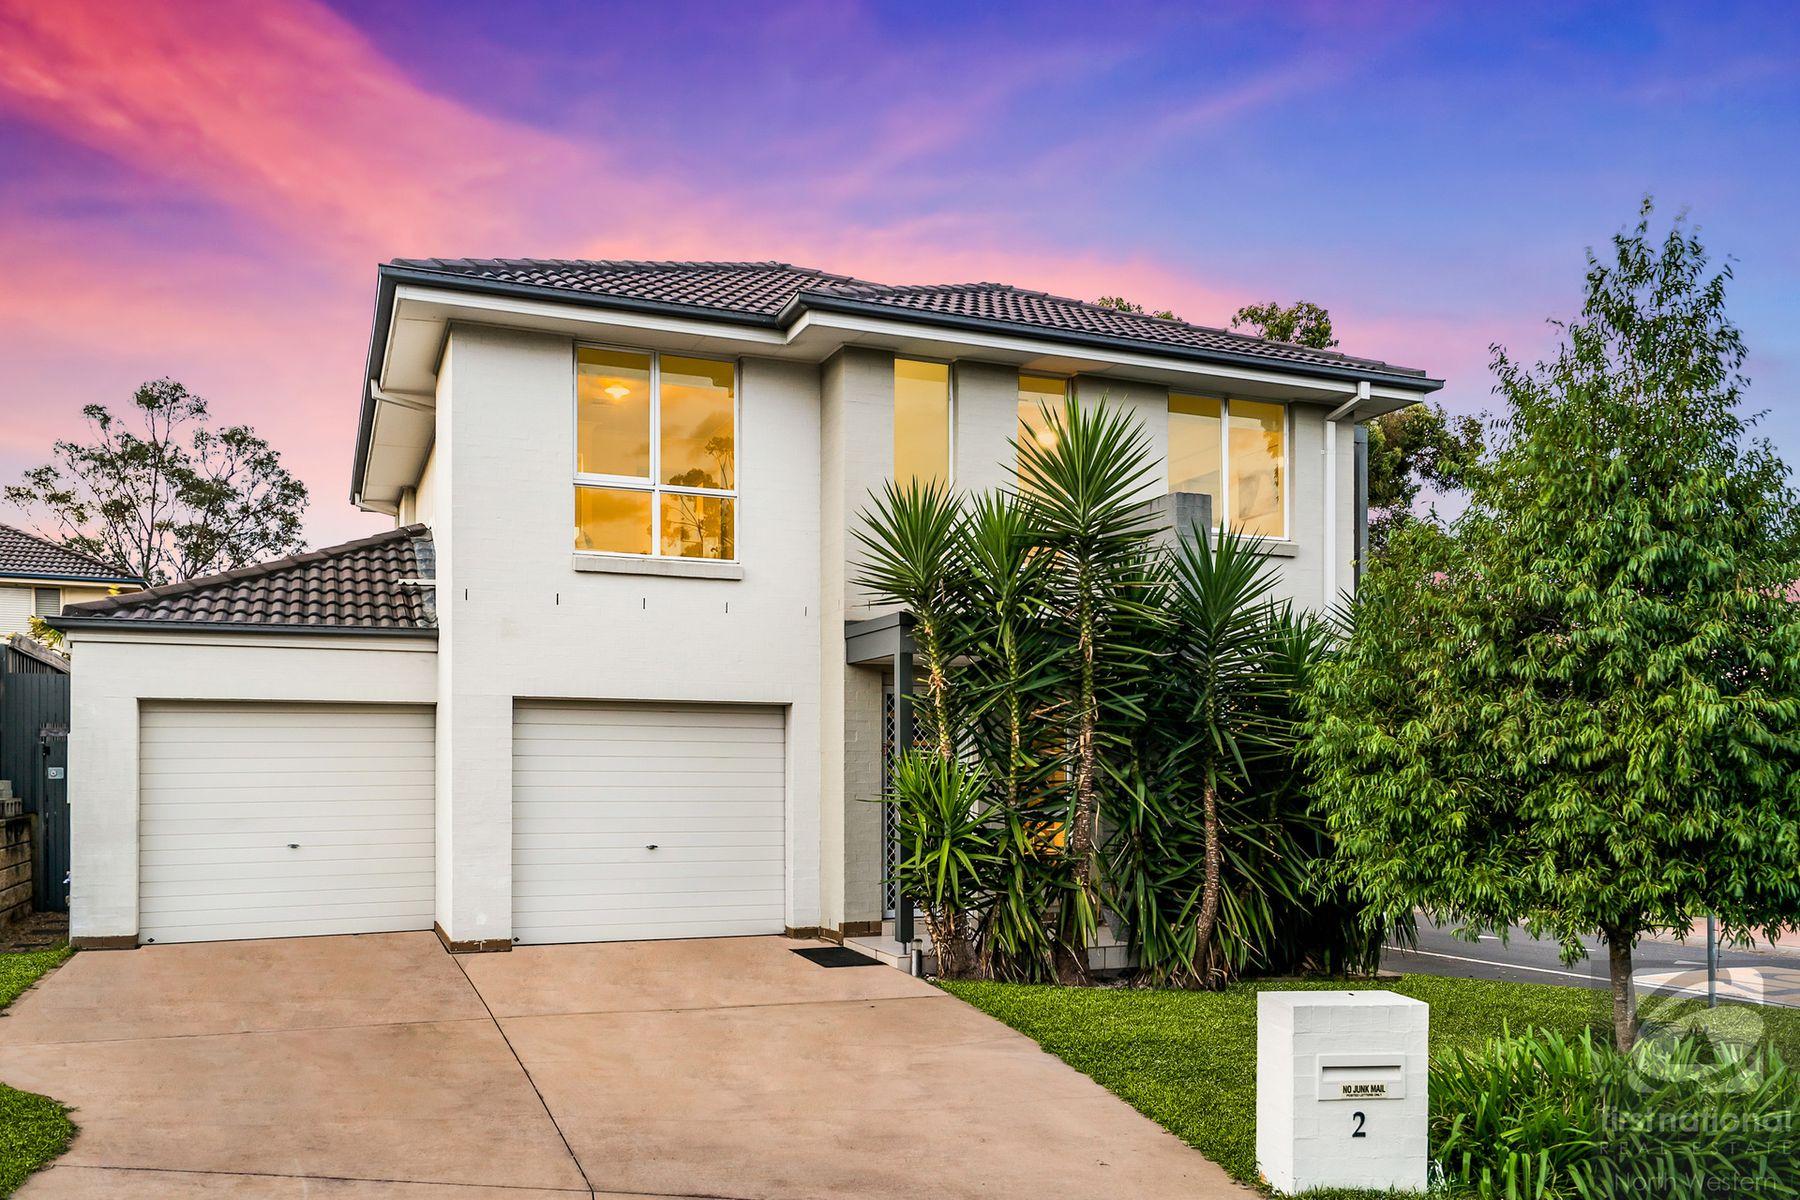 2 Didcot Close, Stanhope Gardens, NSW 2768